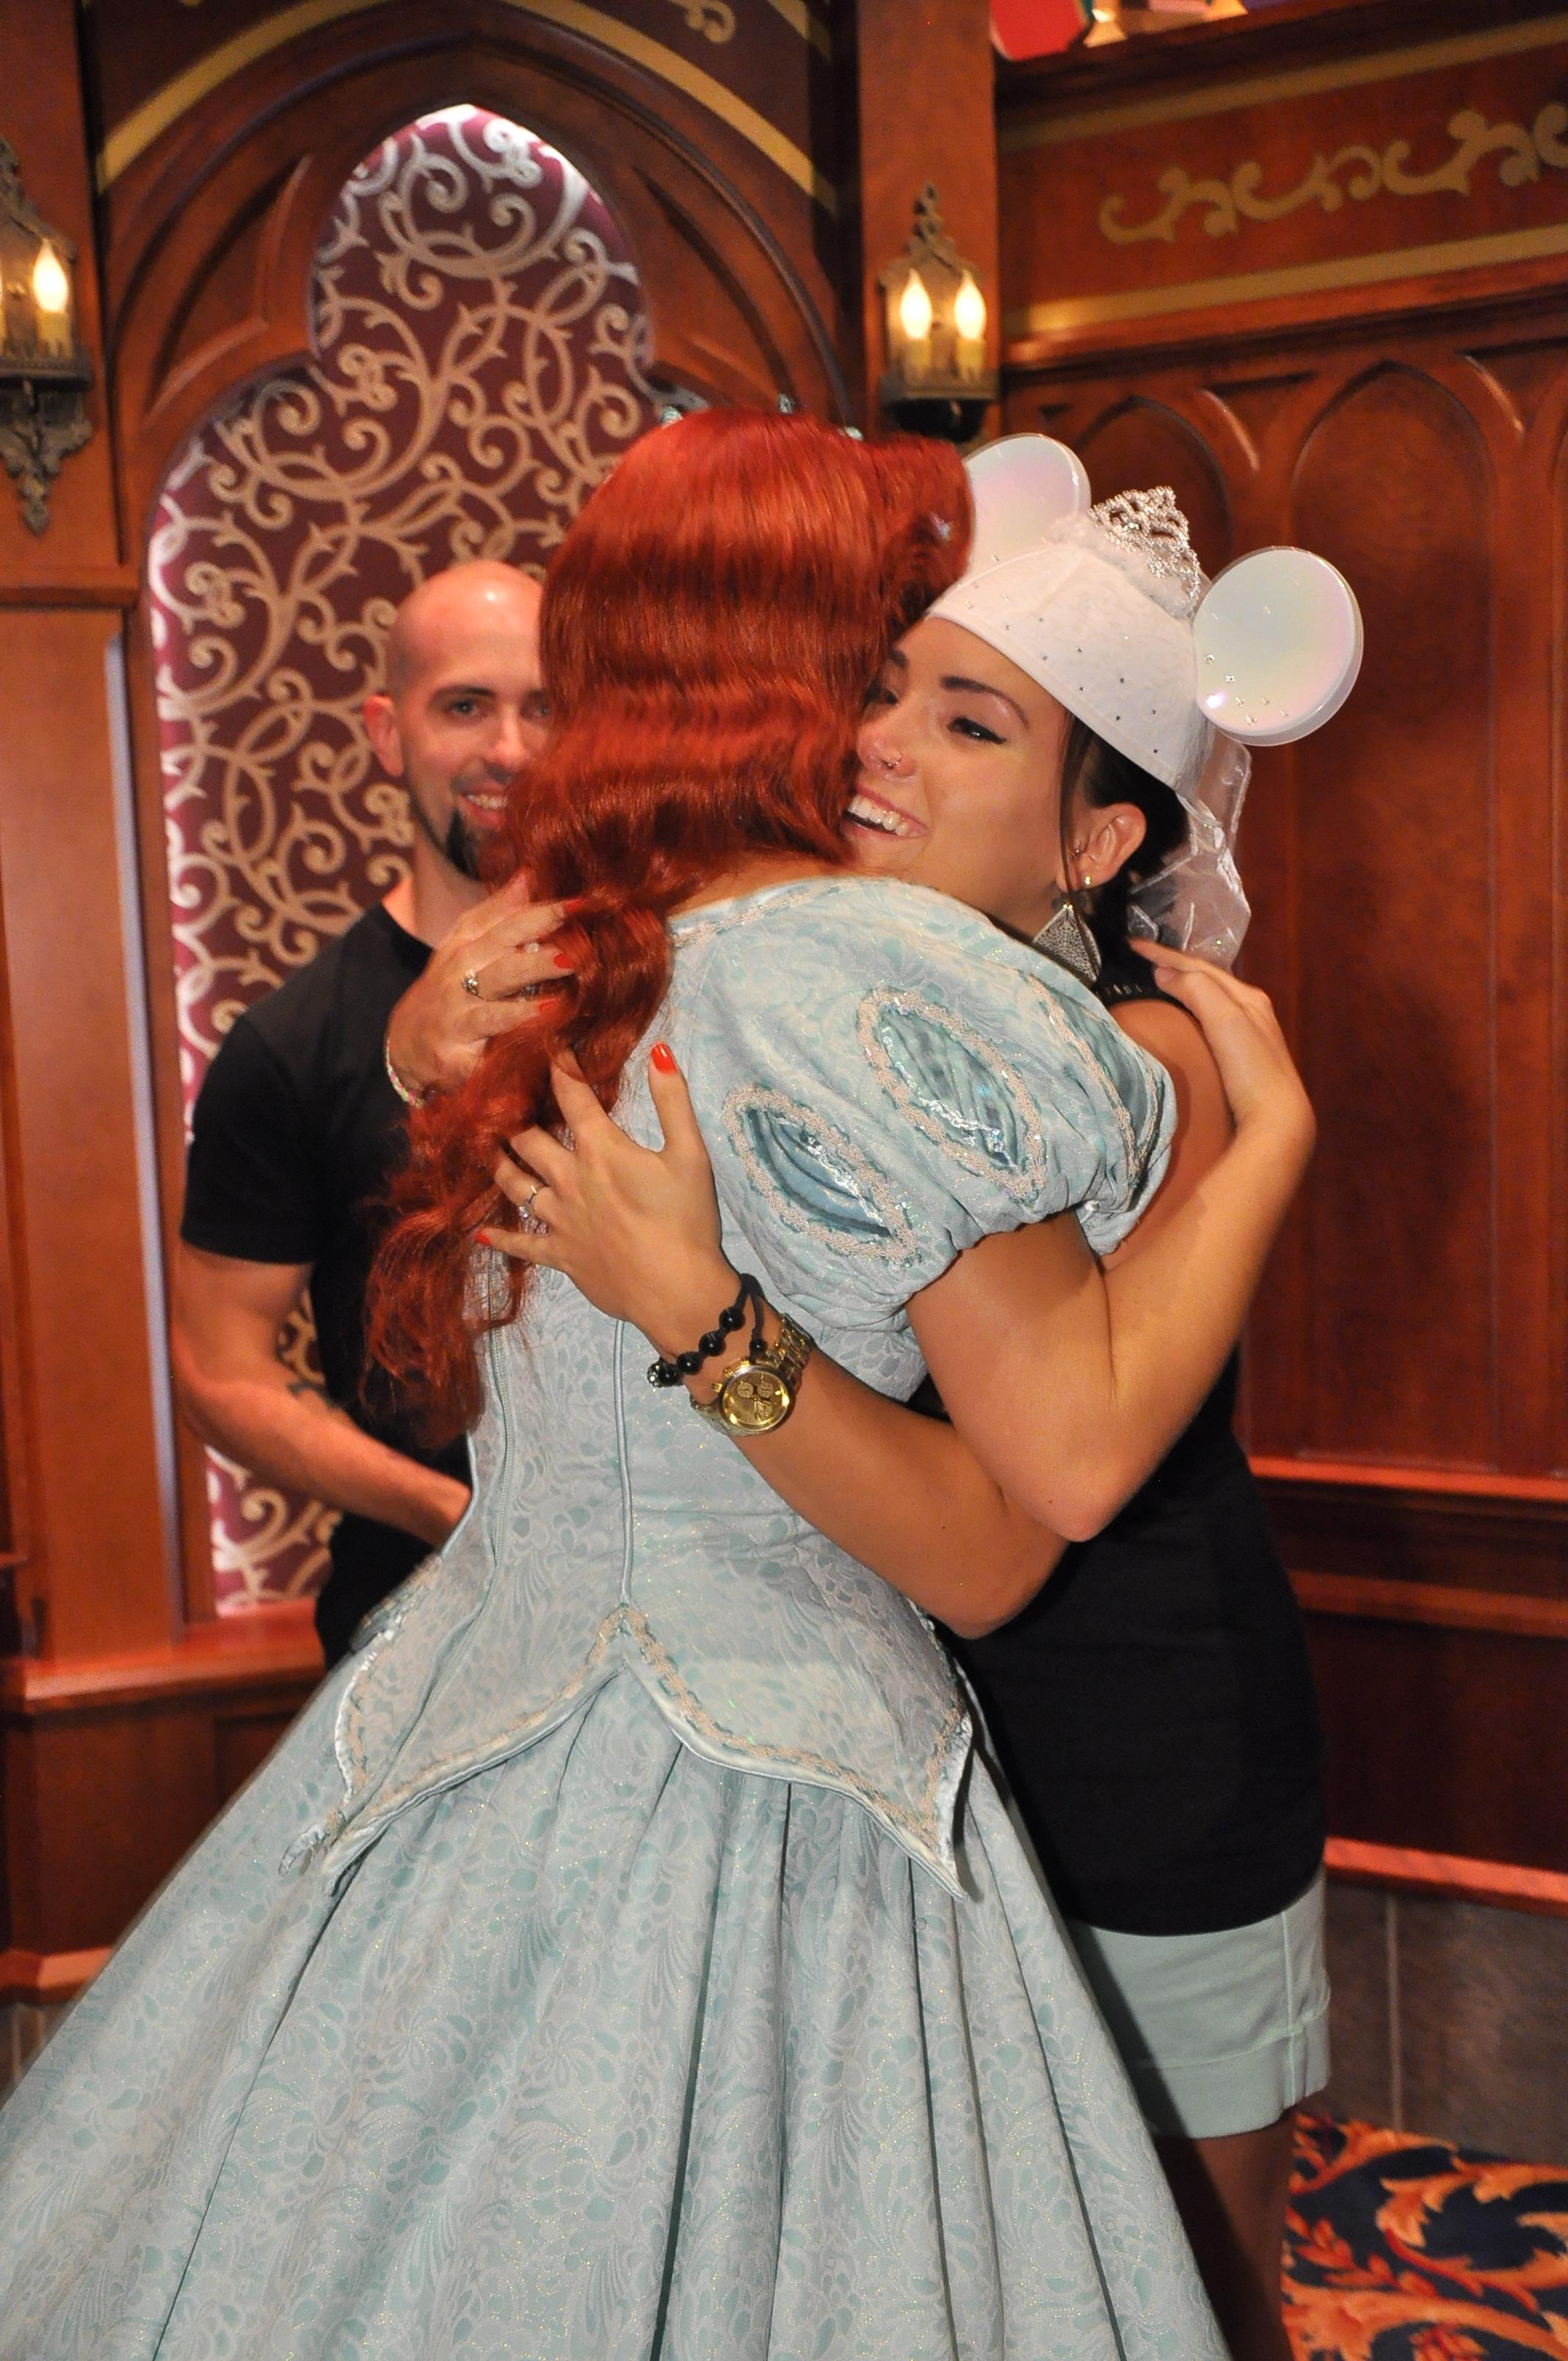 Image 7 of Elizabeth and Tommy's Disneyland Proposal